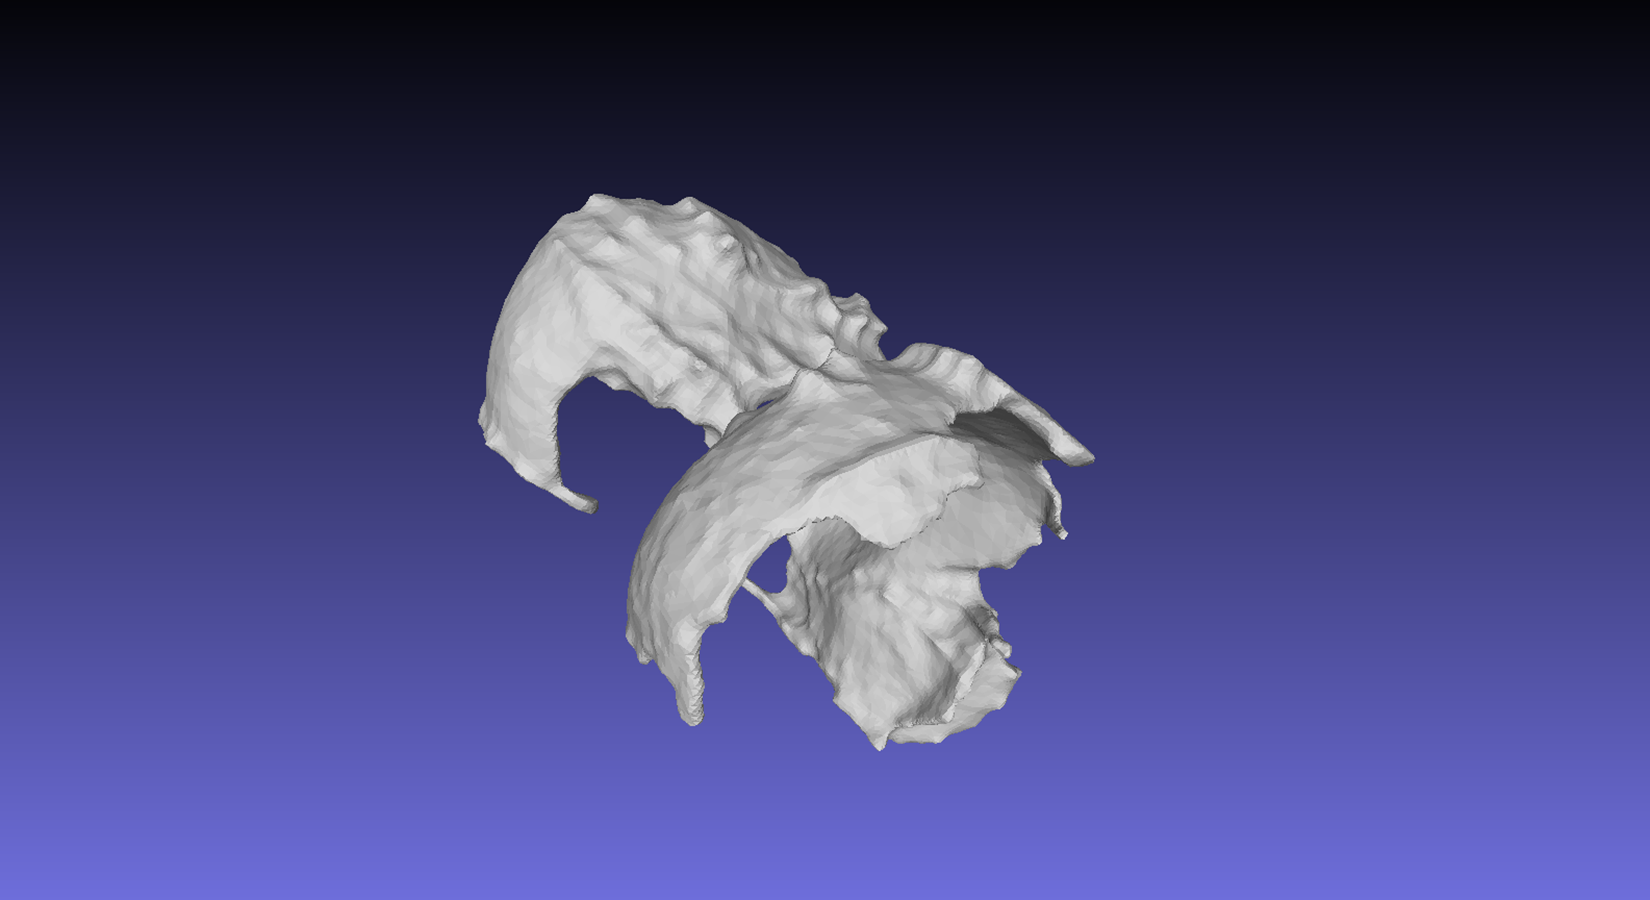 Articular Cartilage 3D model